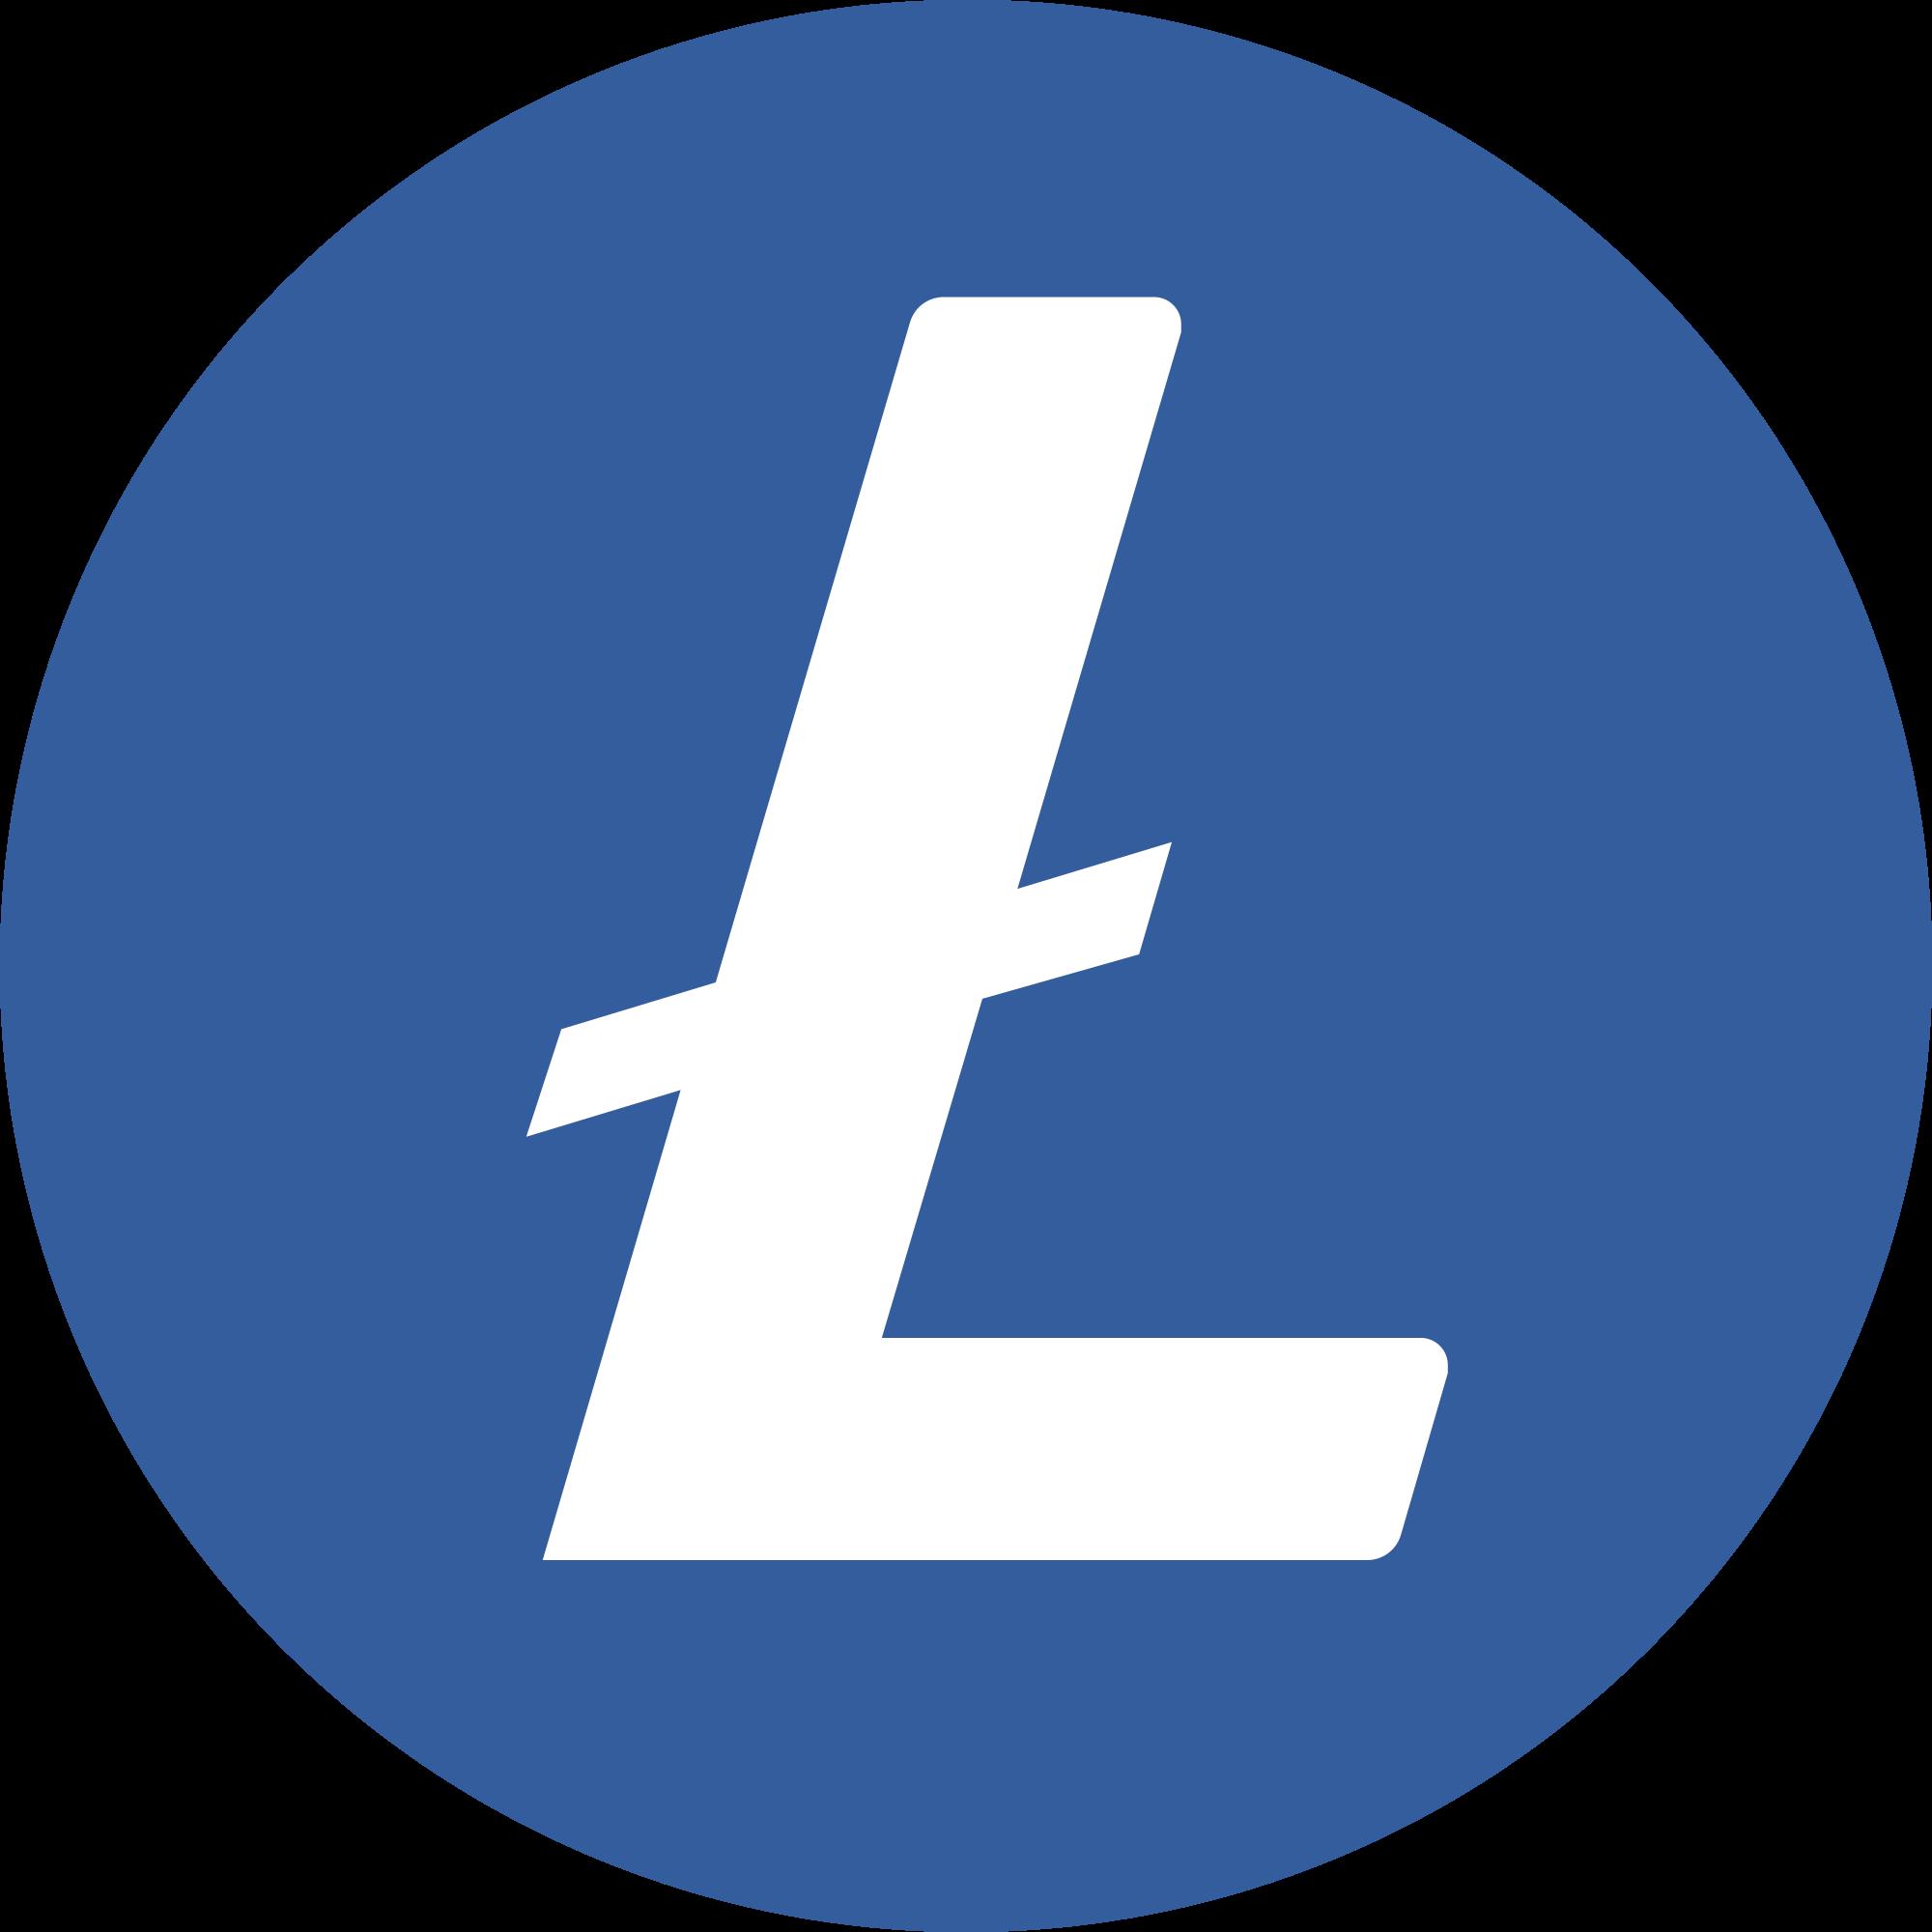 litecoin ltc logo transparent png background free download